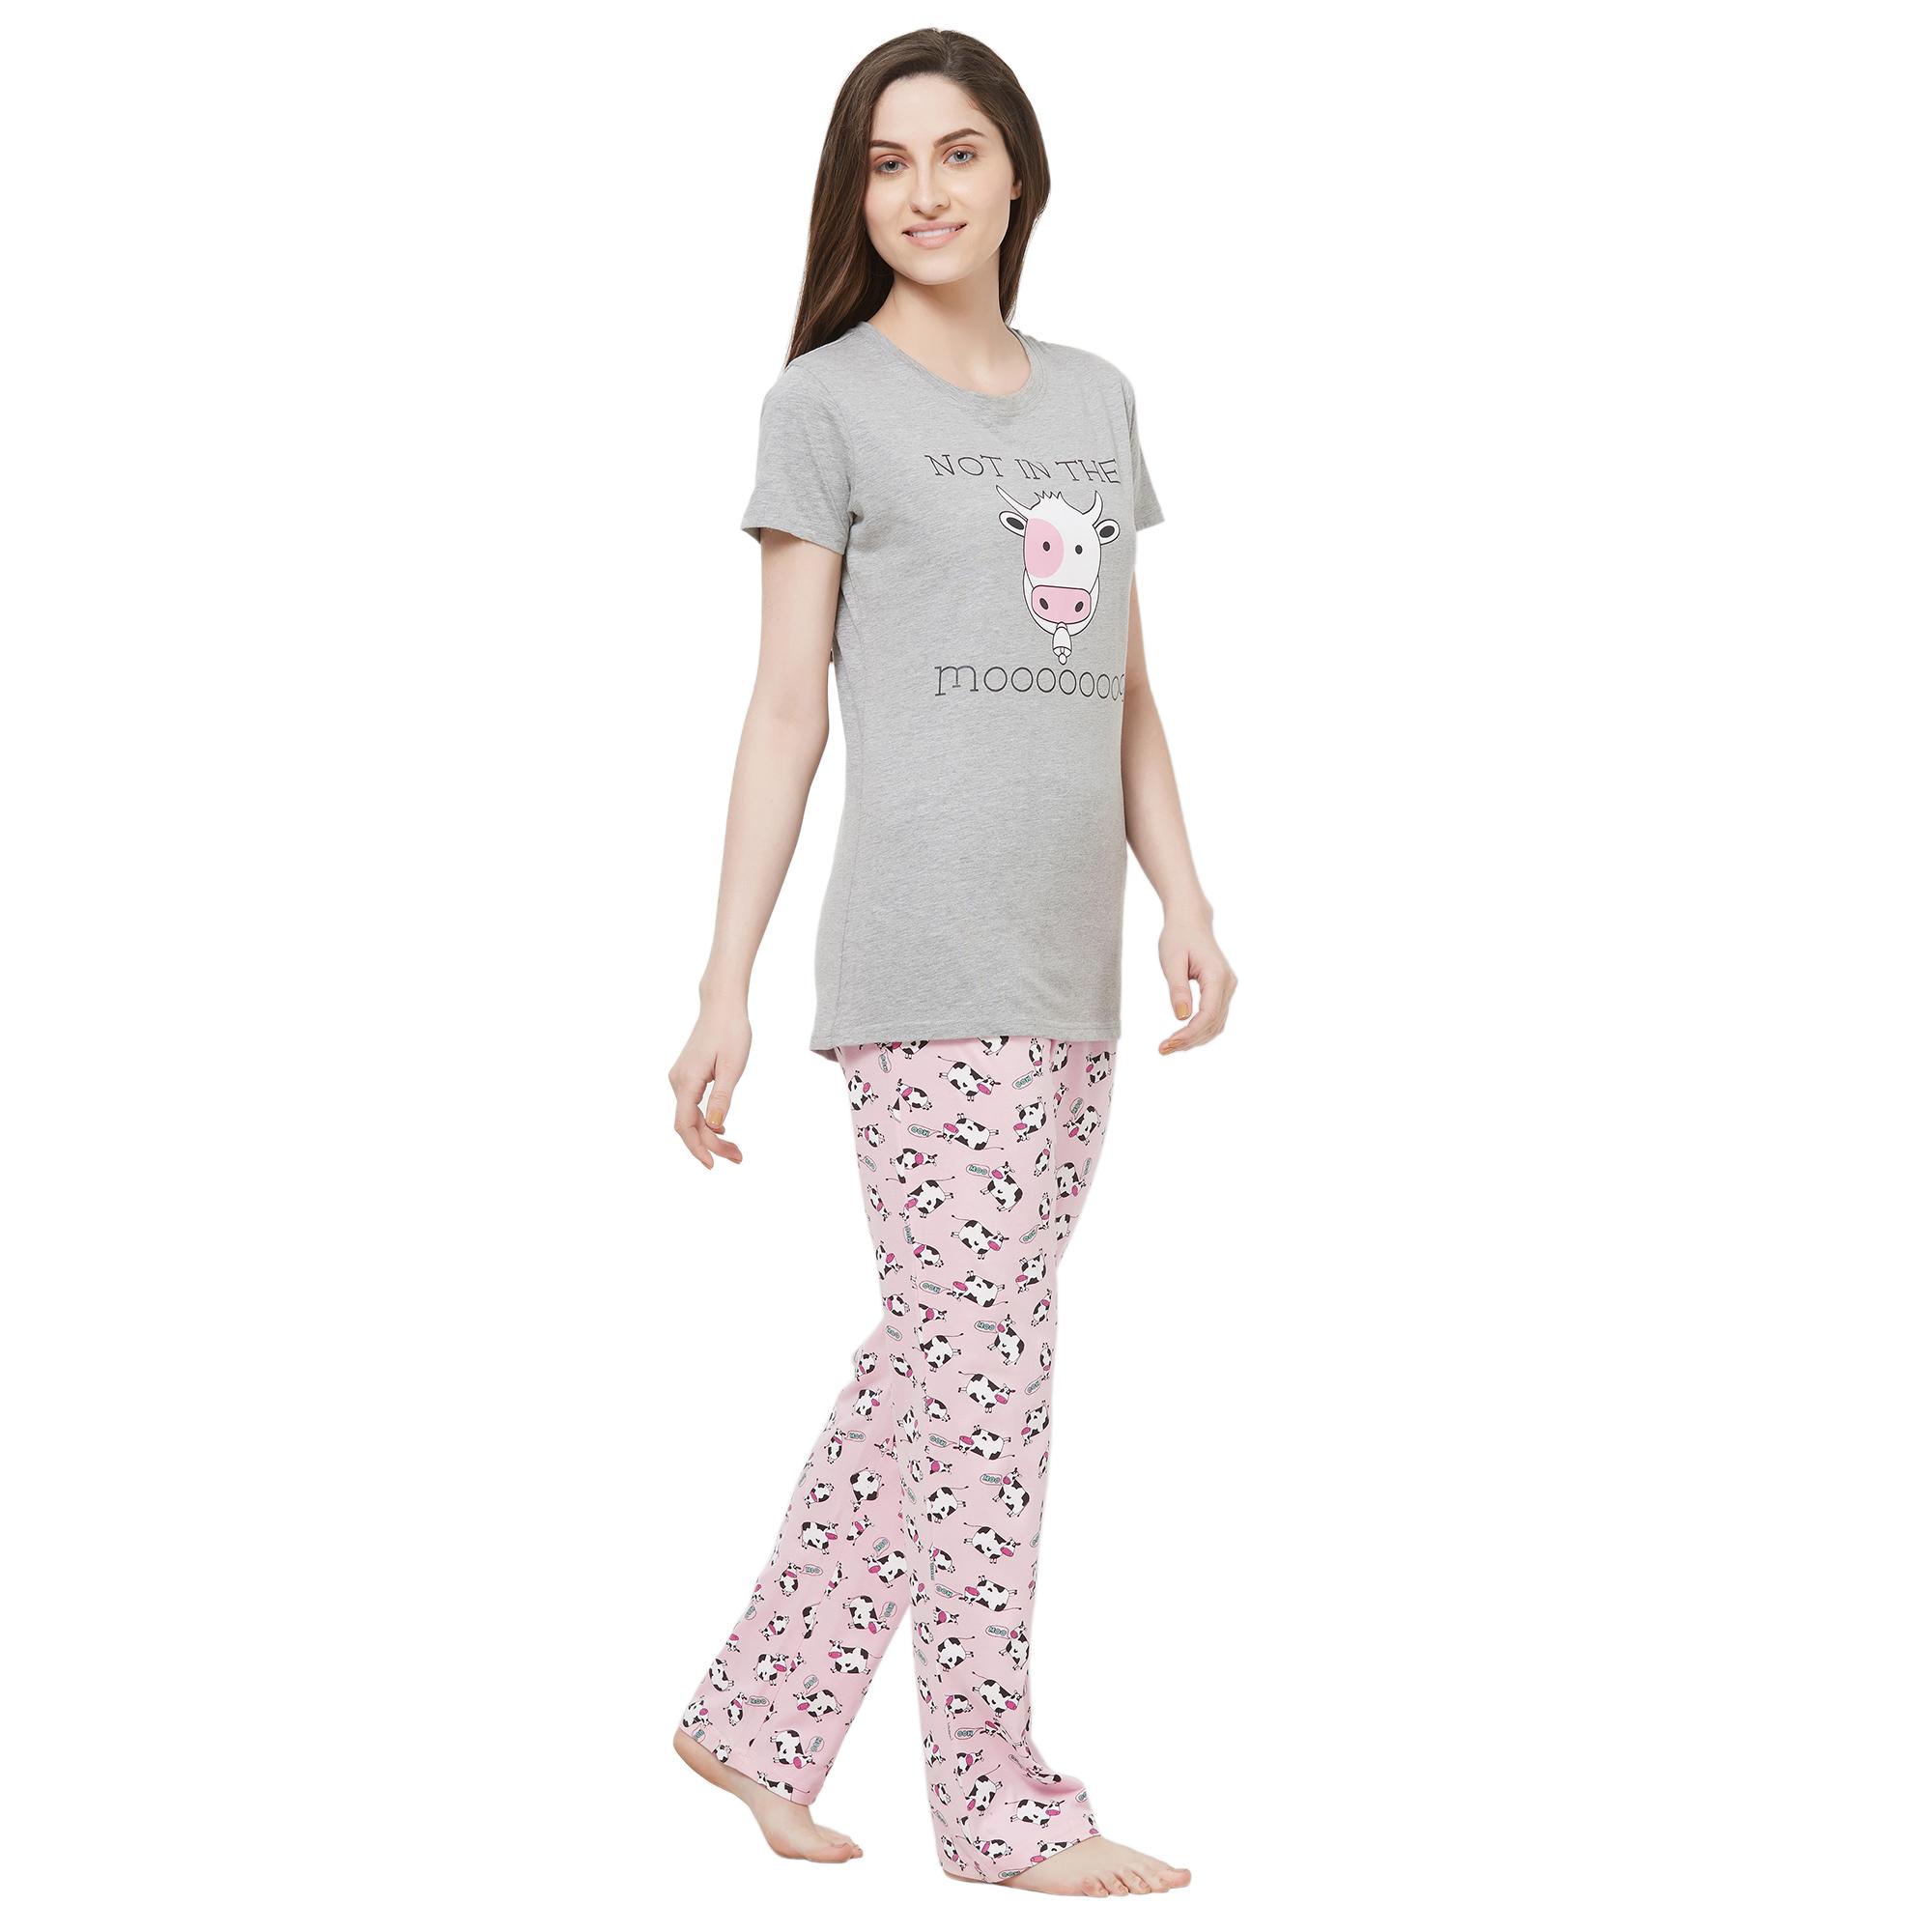 Evolove Womens Pajama T-Shirt Sets (EVO1)